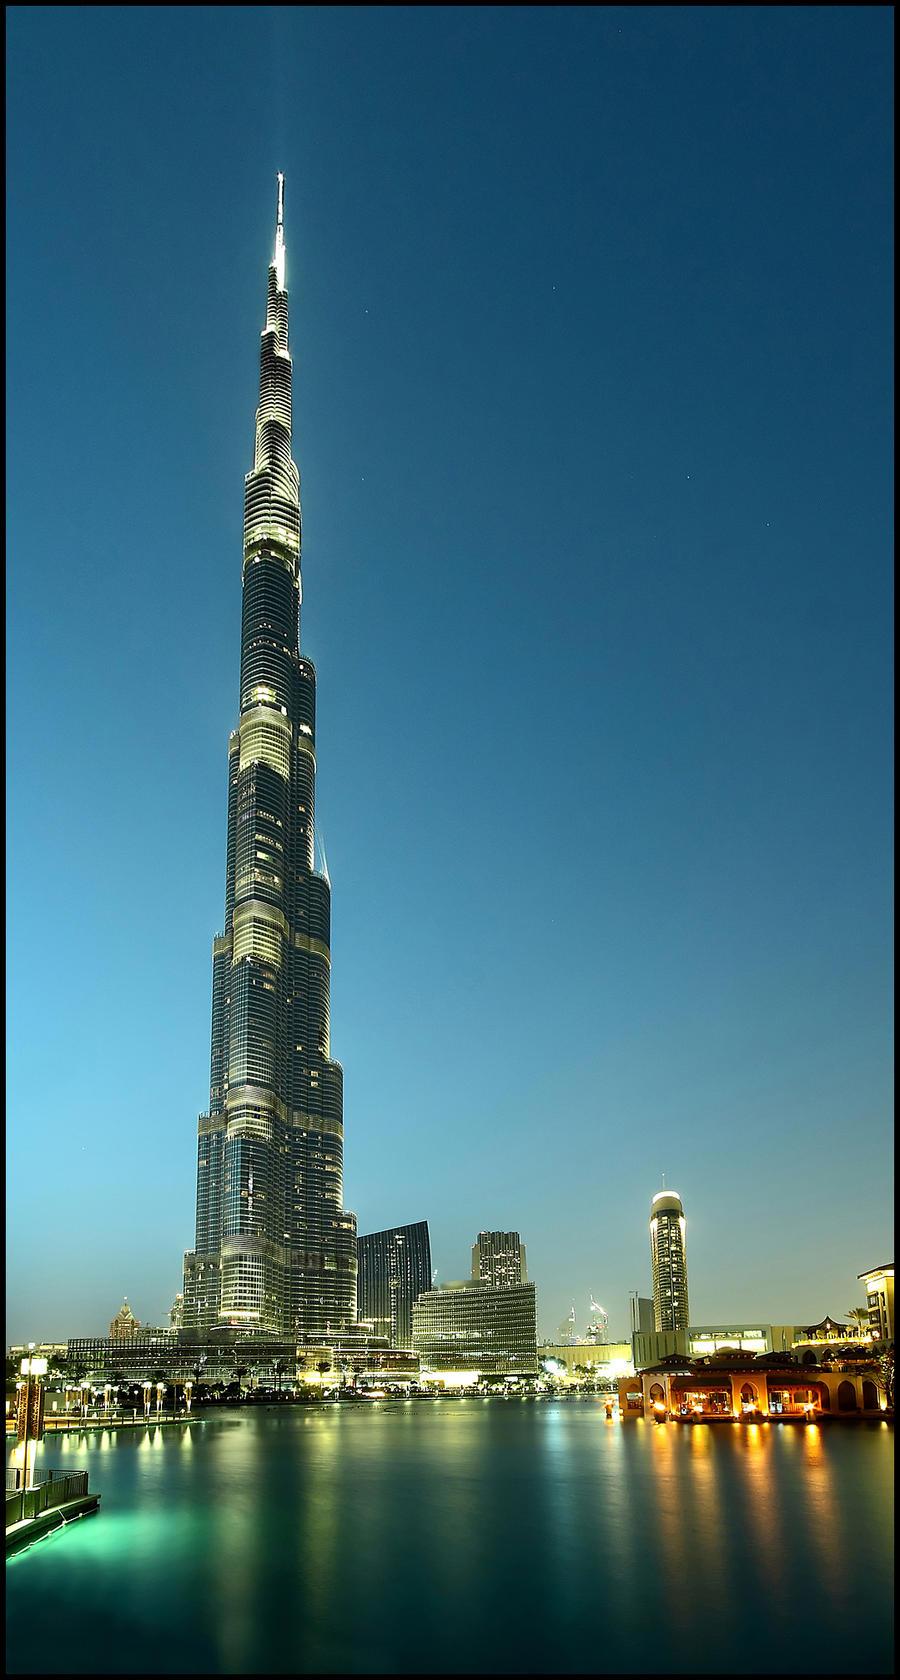 Burj Dubai by Shoayb